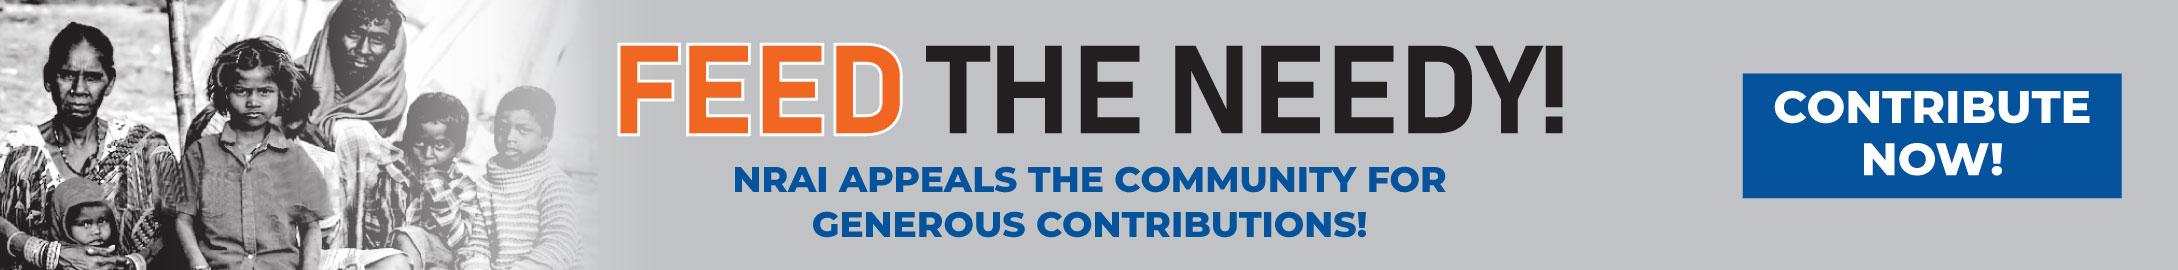 Feed-the-needy-Website-Head-Banner.jpg